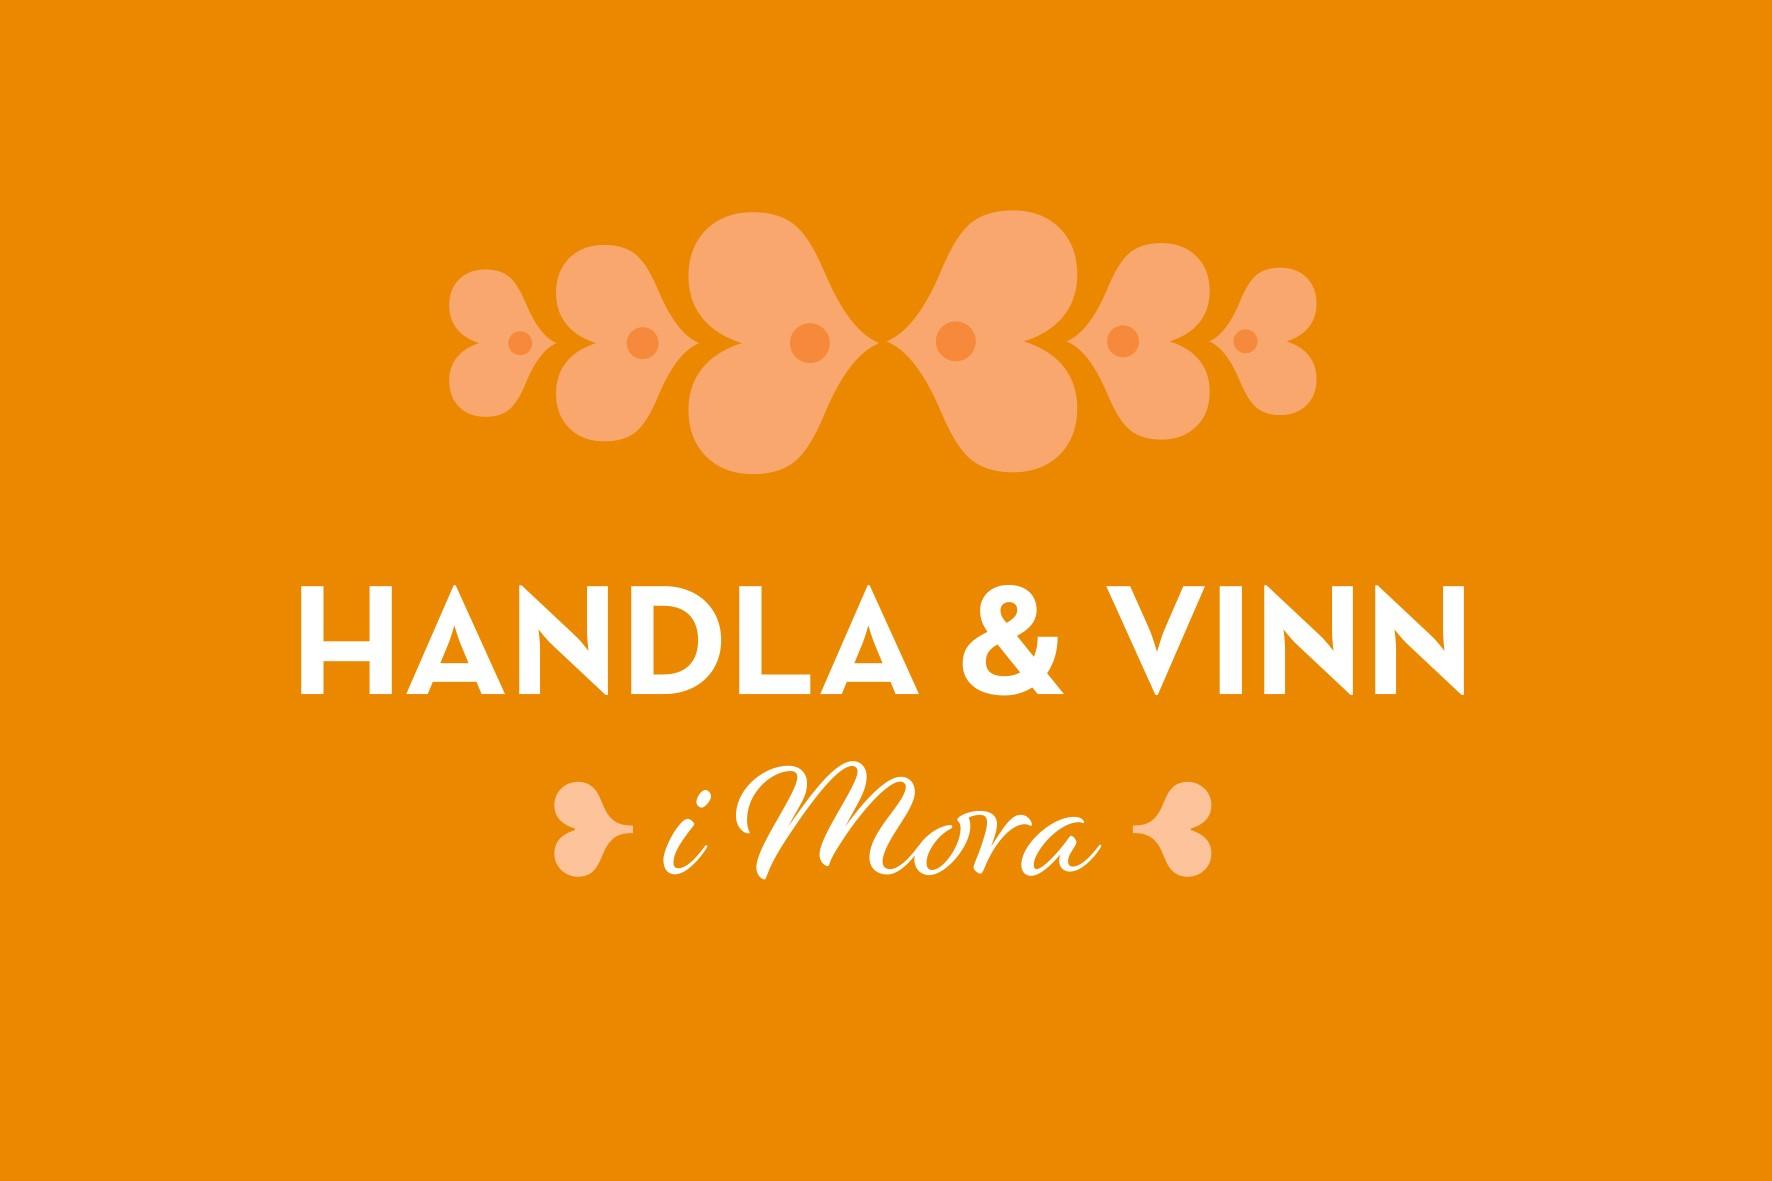 Handla & Vinn